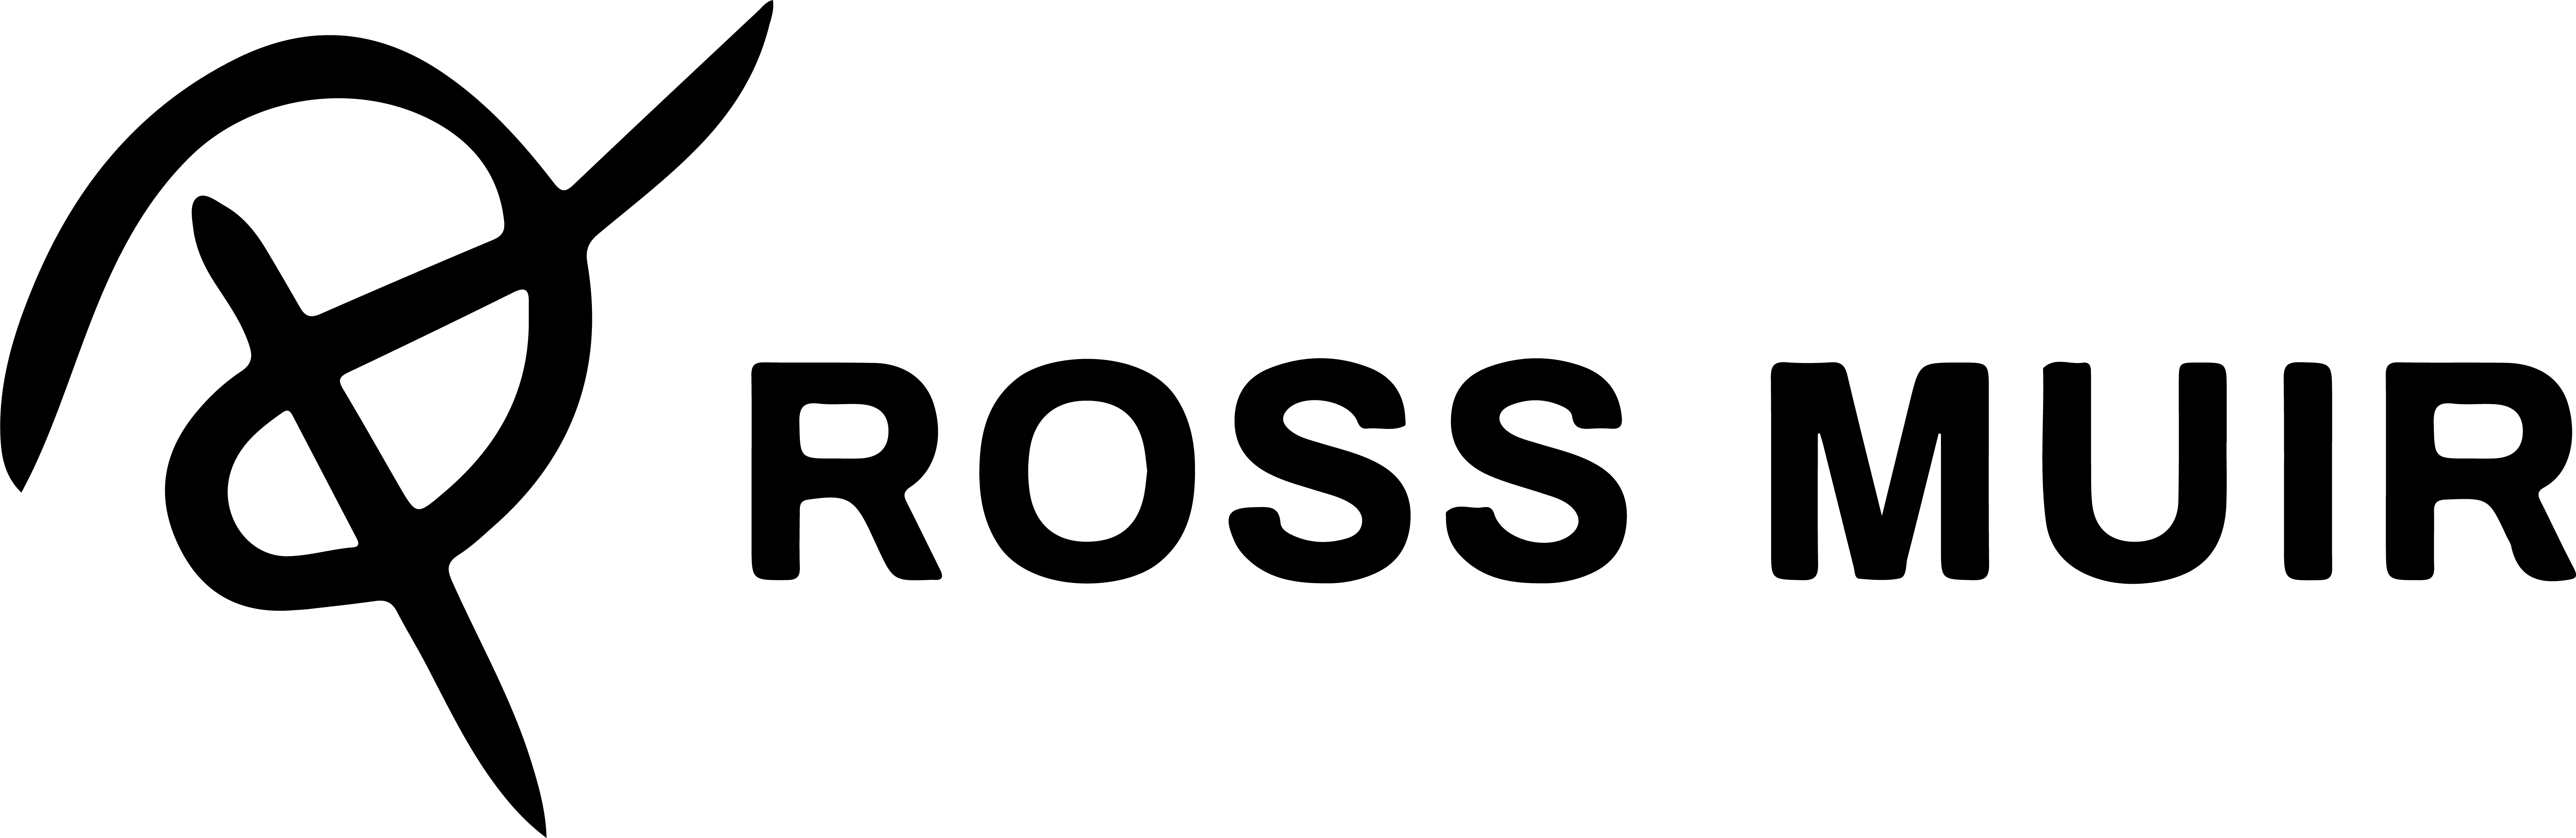 Ross Muir Logo - Black